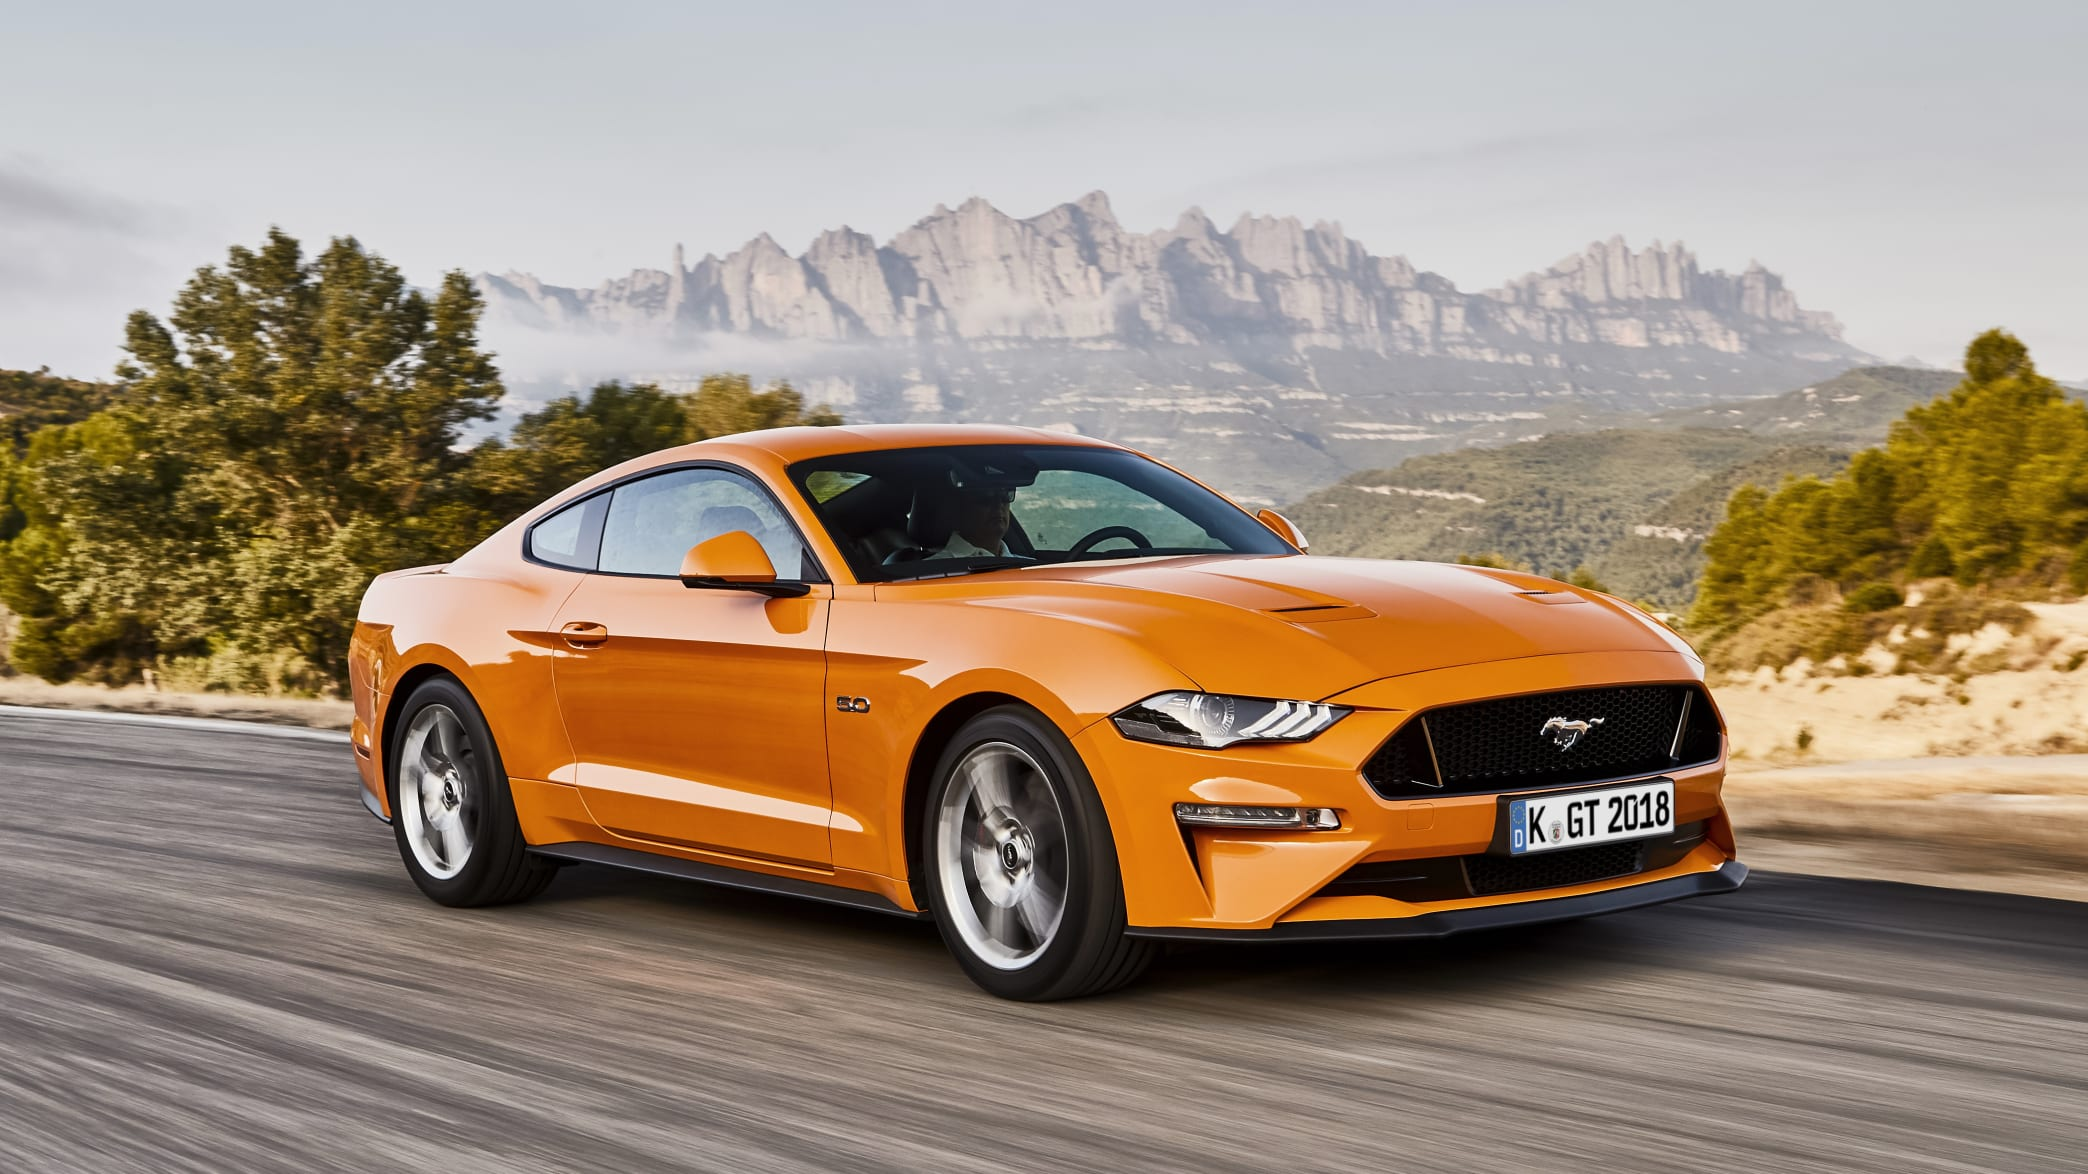 Orangener Ford Mustang Sportwagen fahrend